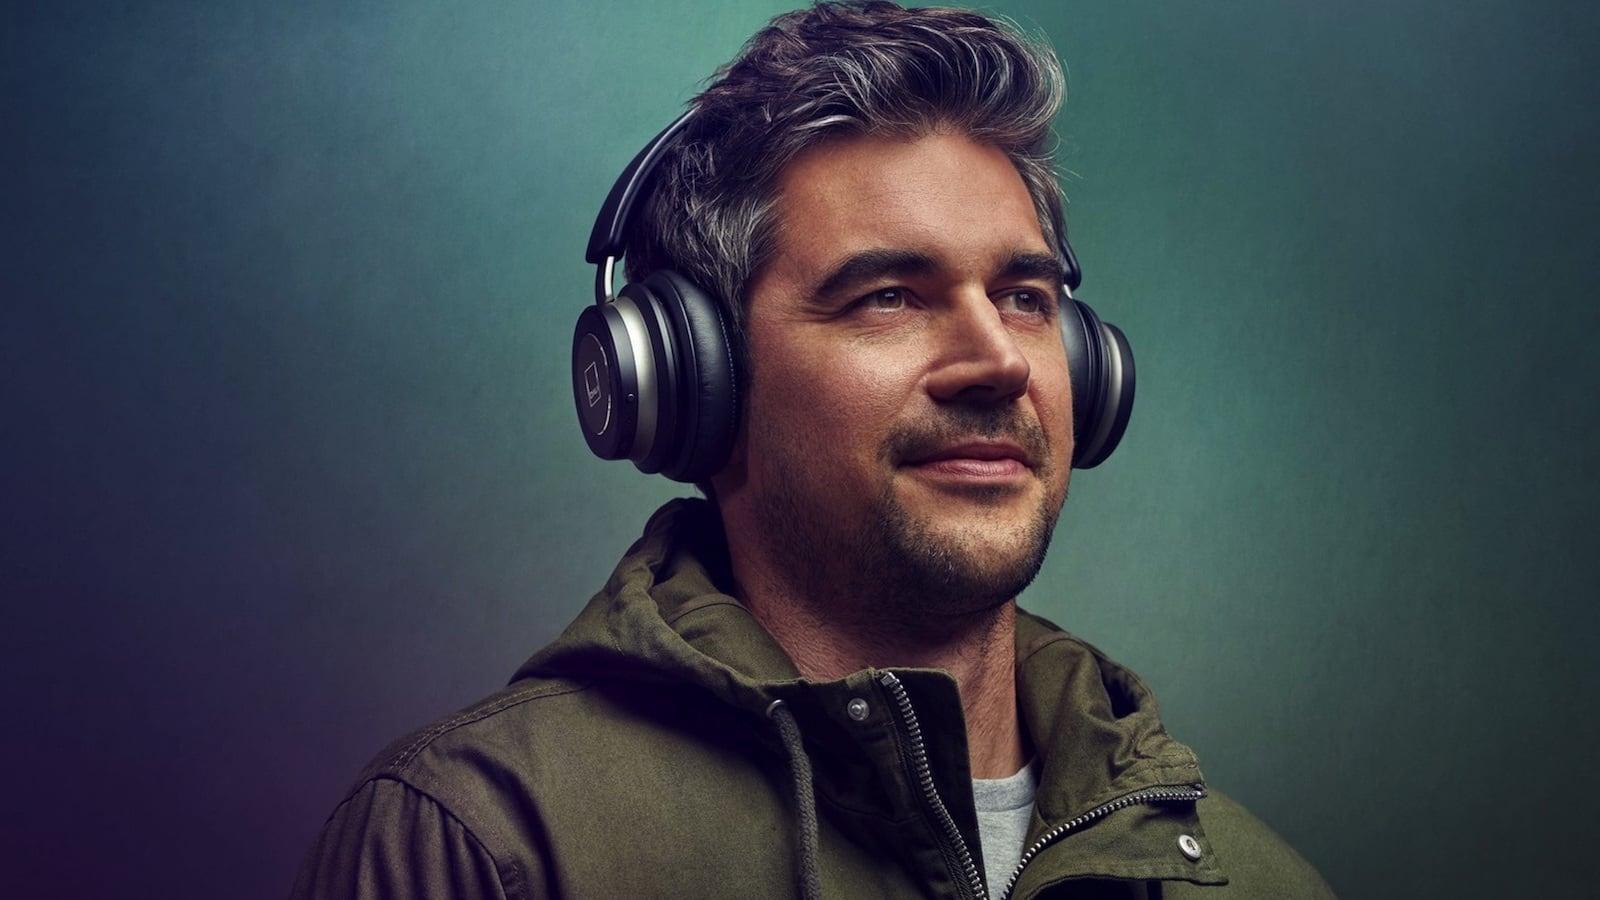 Dali IO-6 Immersive Noise Canceling Headphones